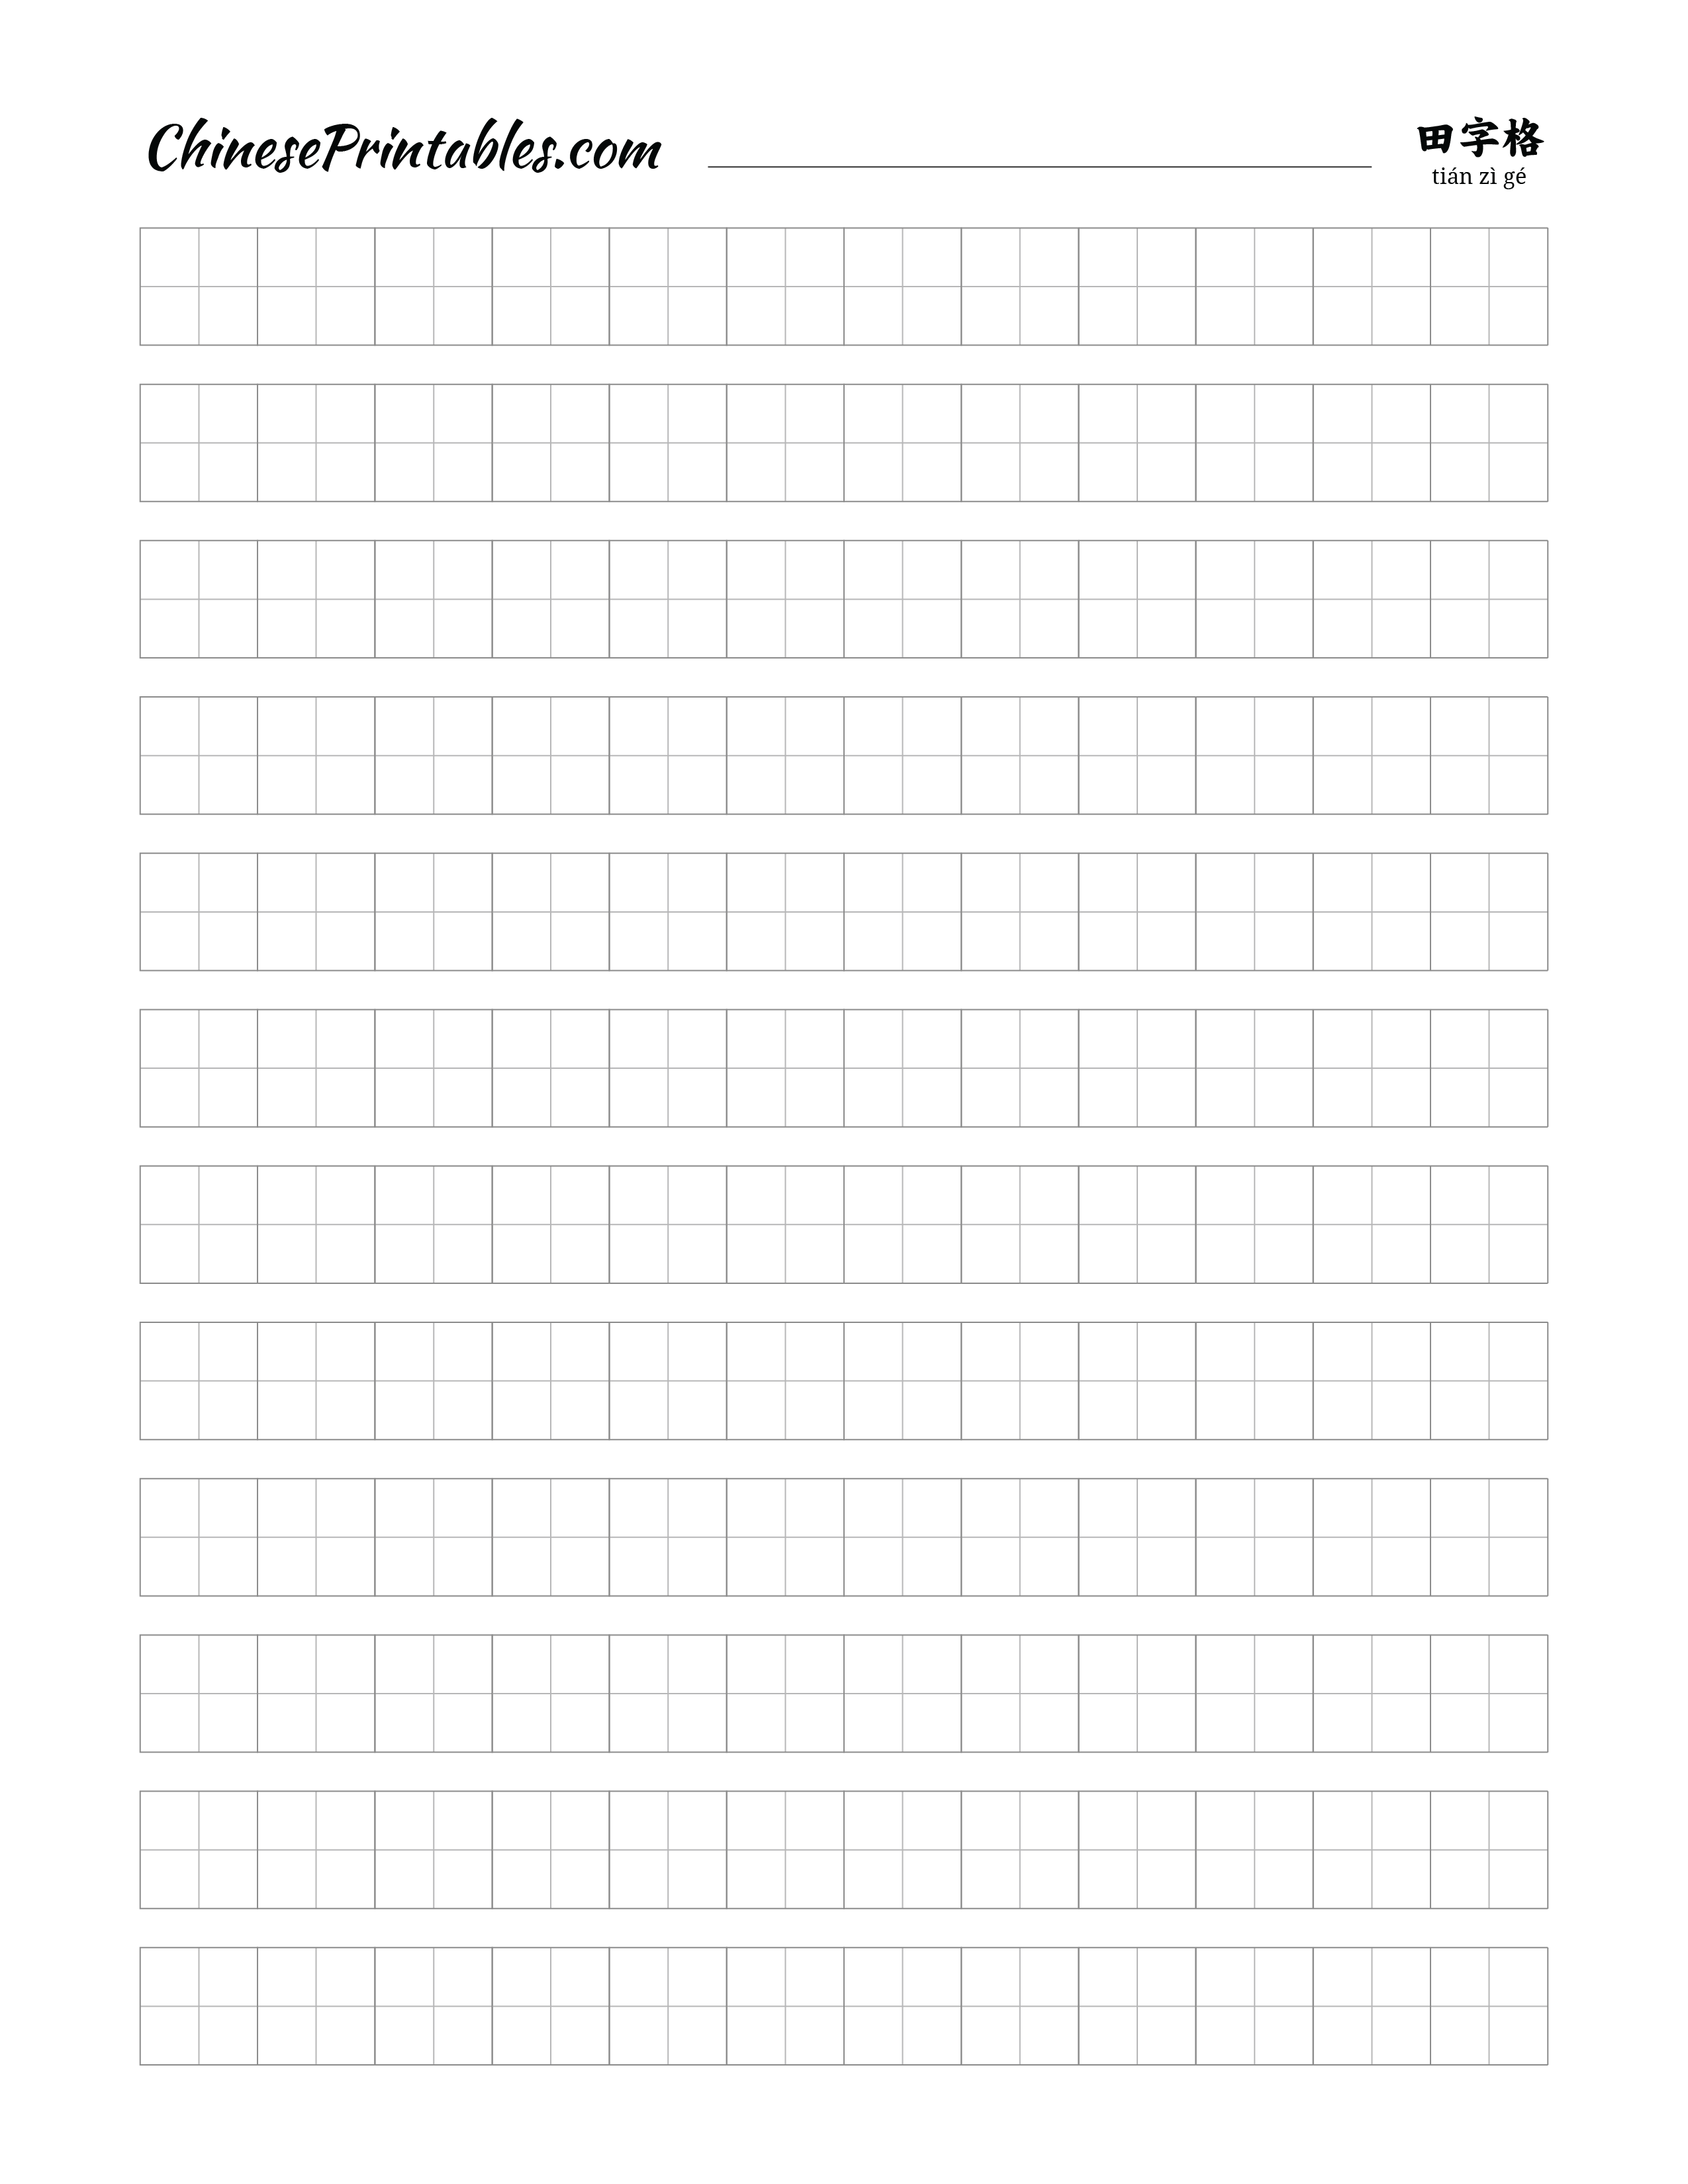 Spreadsheet Drawing At Getdrawings